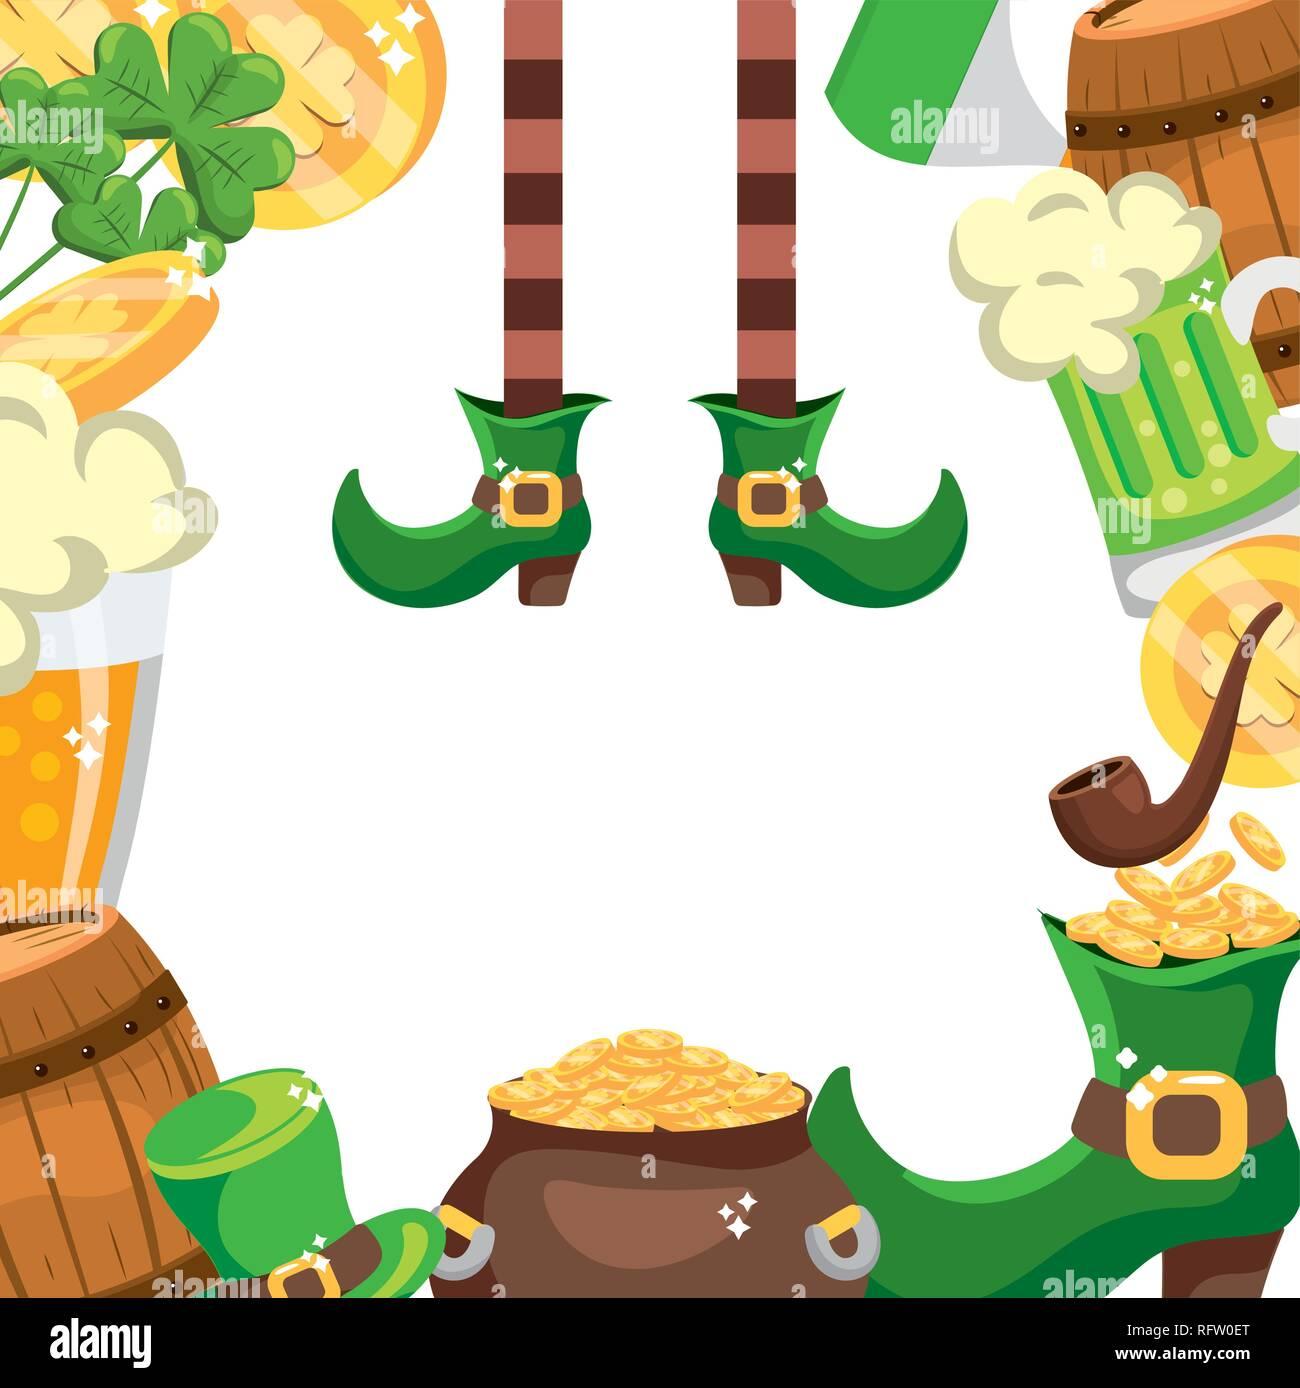 leprechaun items frame - Stock Image